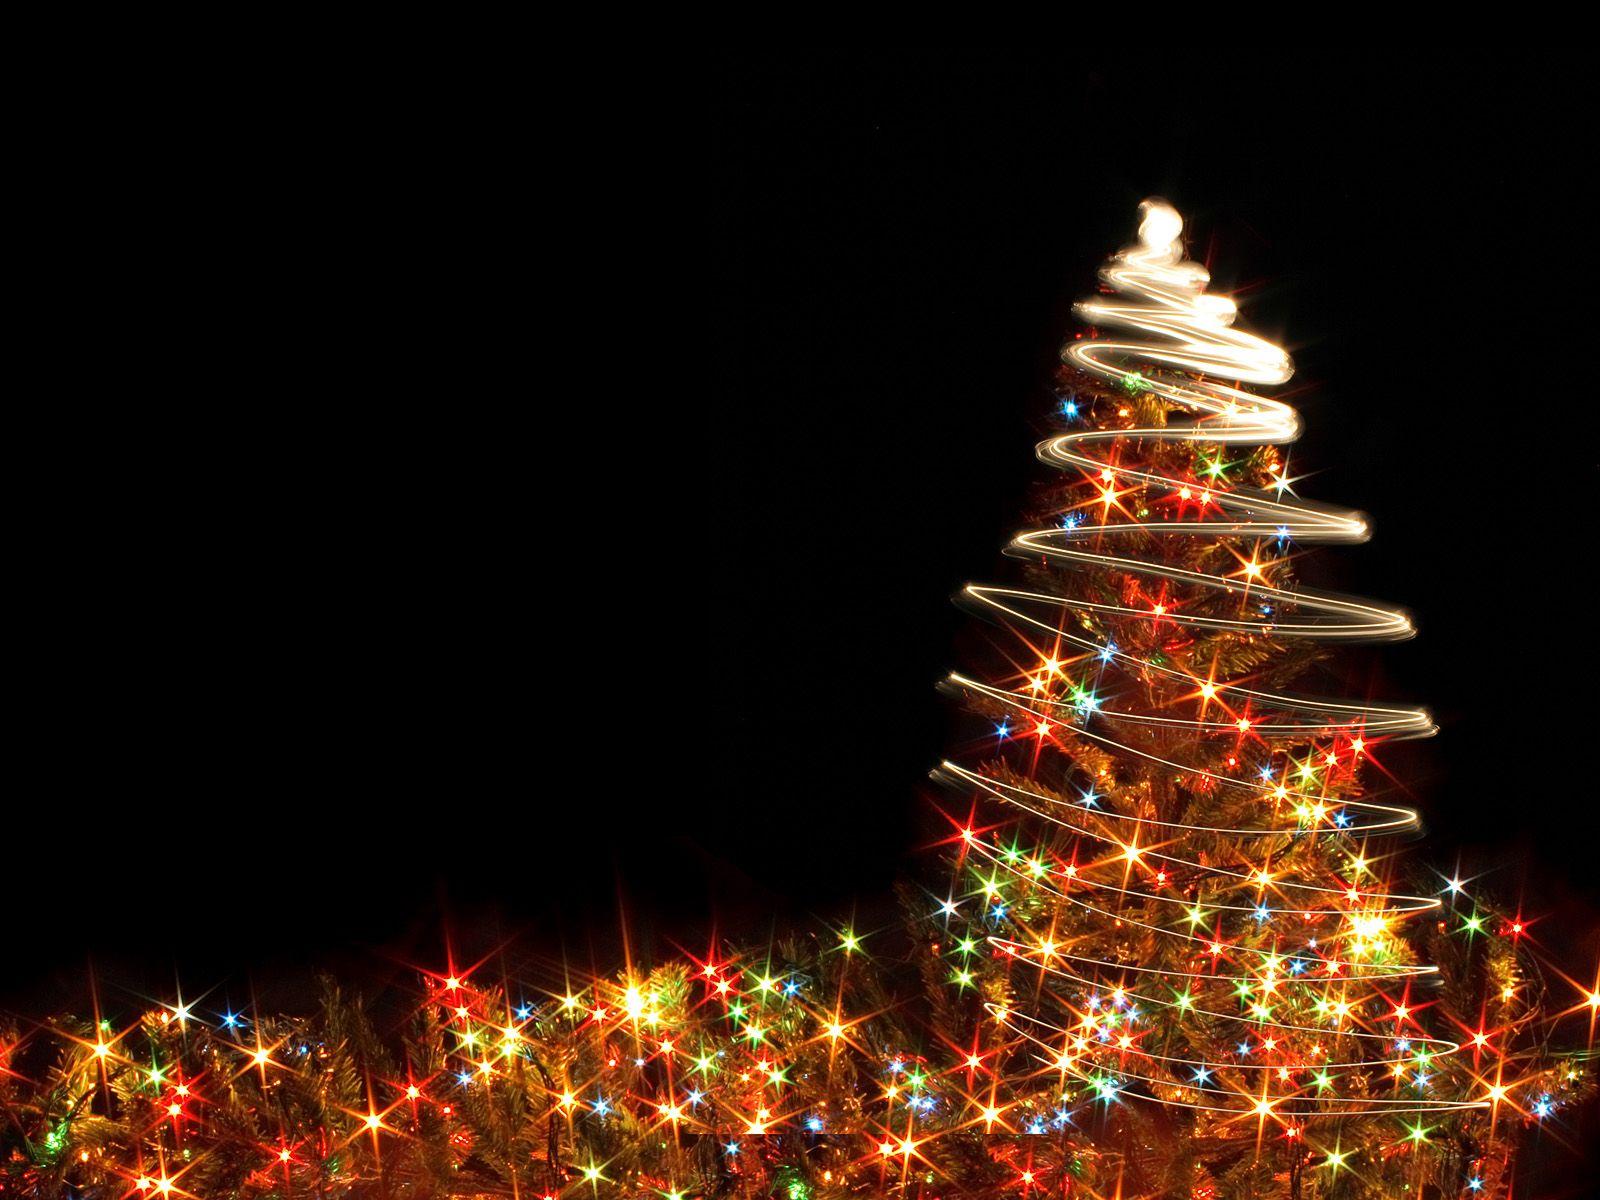 Download Christmas Lights Desktop Wallpaper 55   Wallpaper 1600x1200